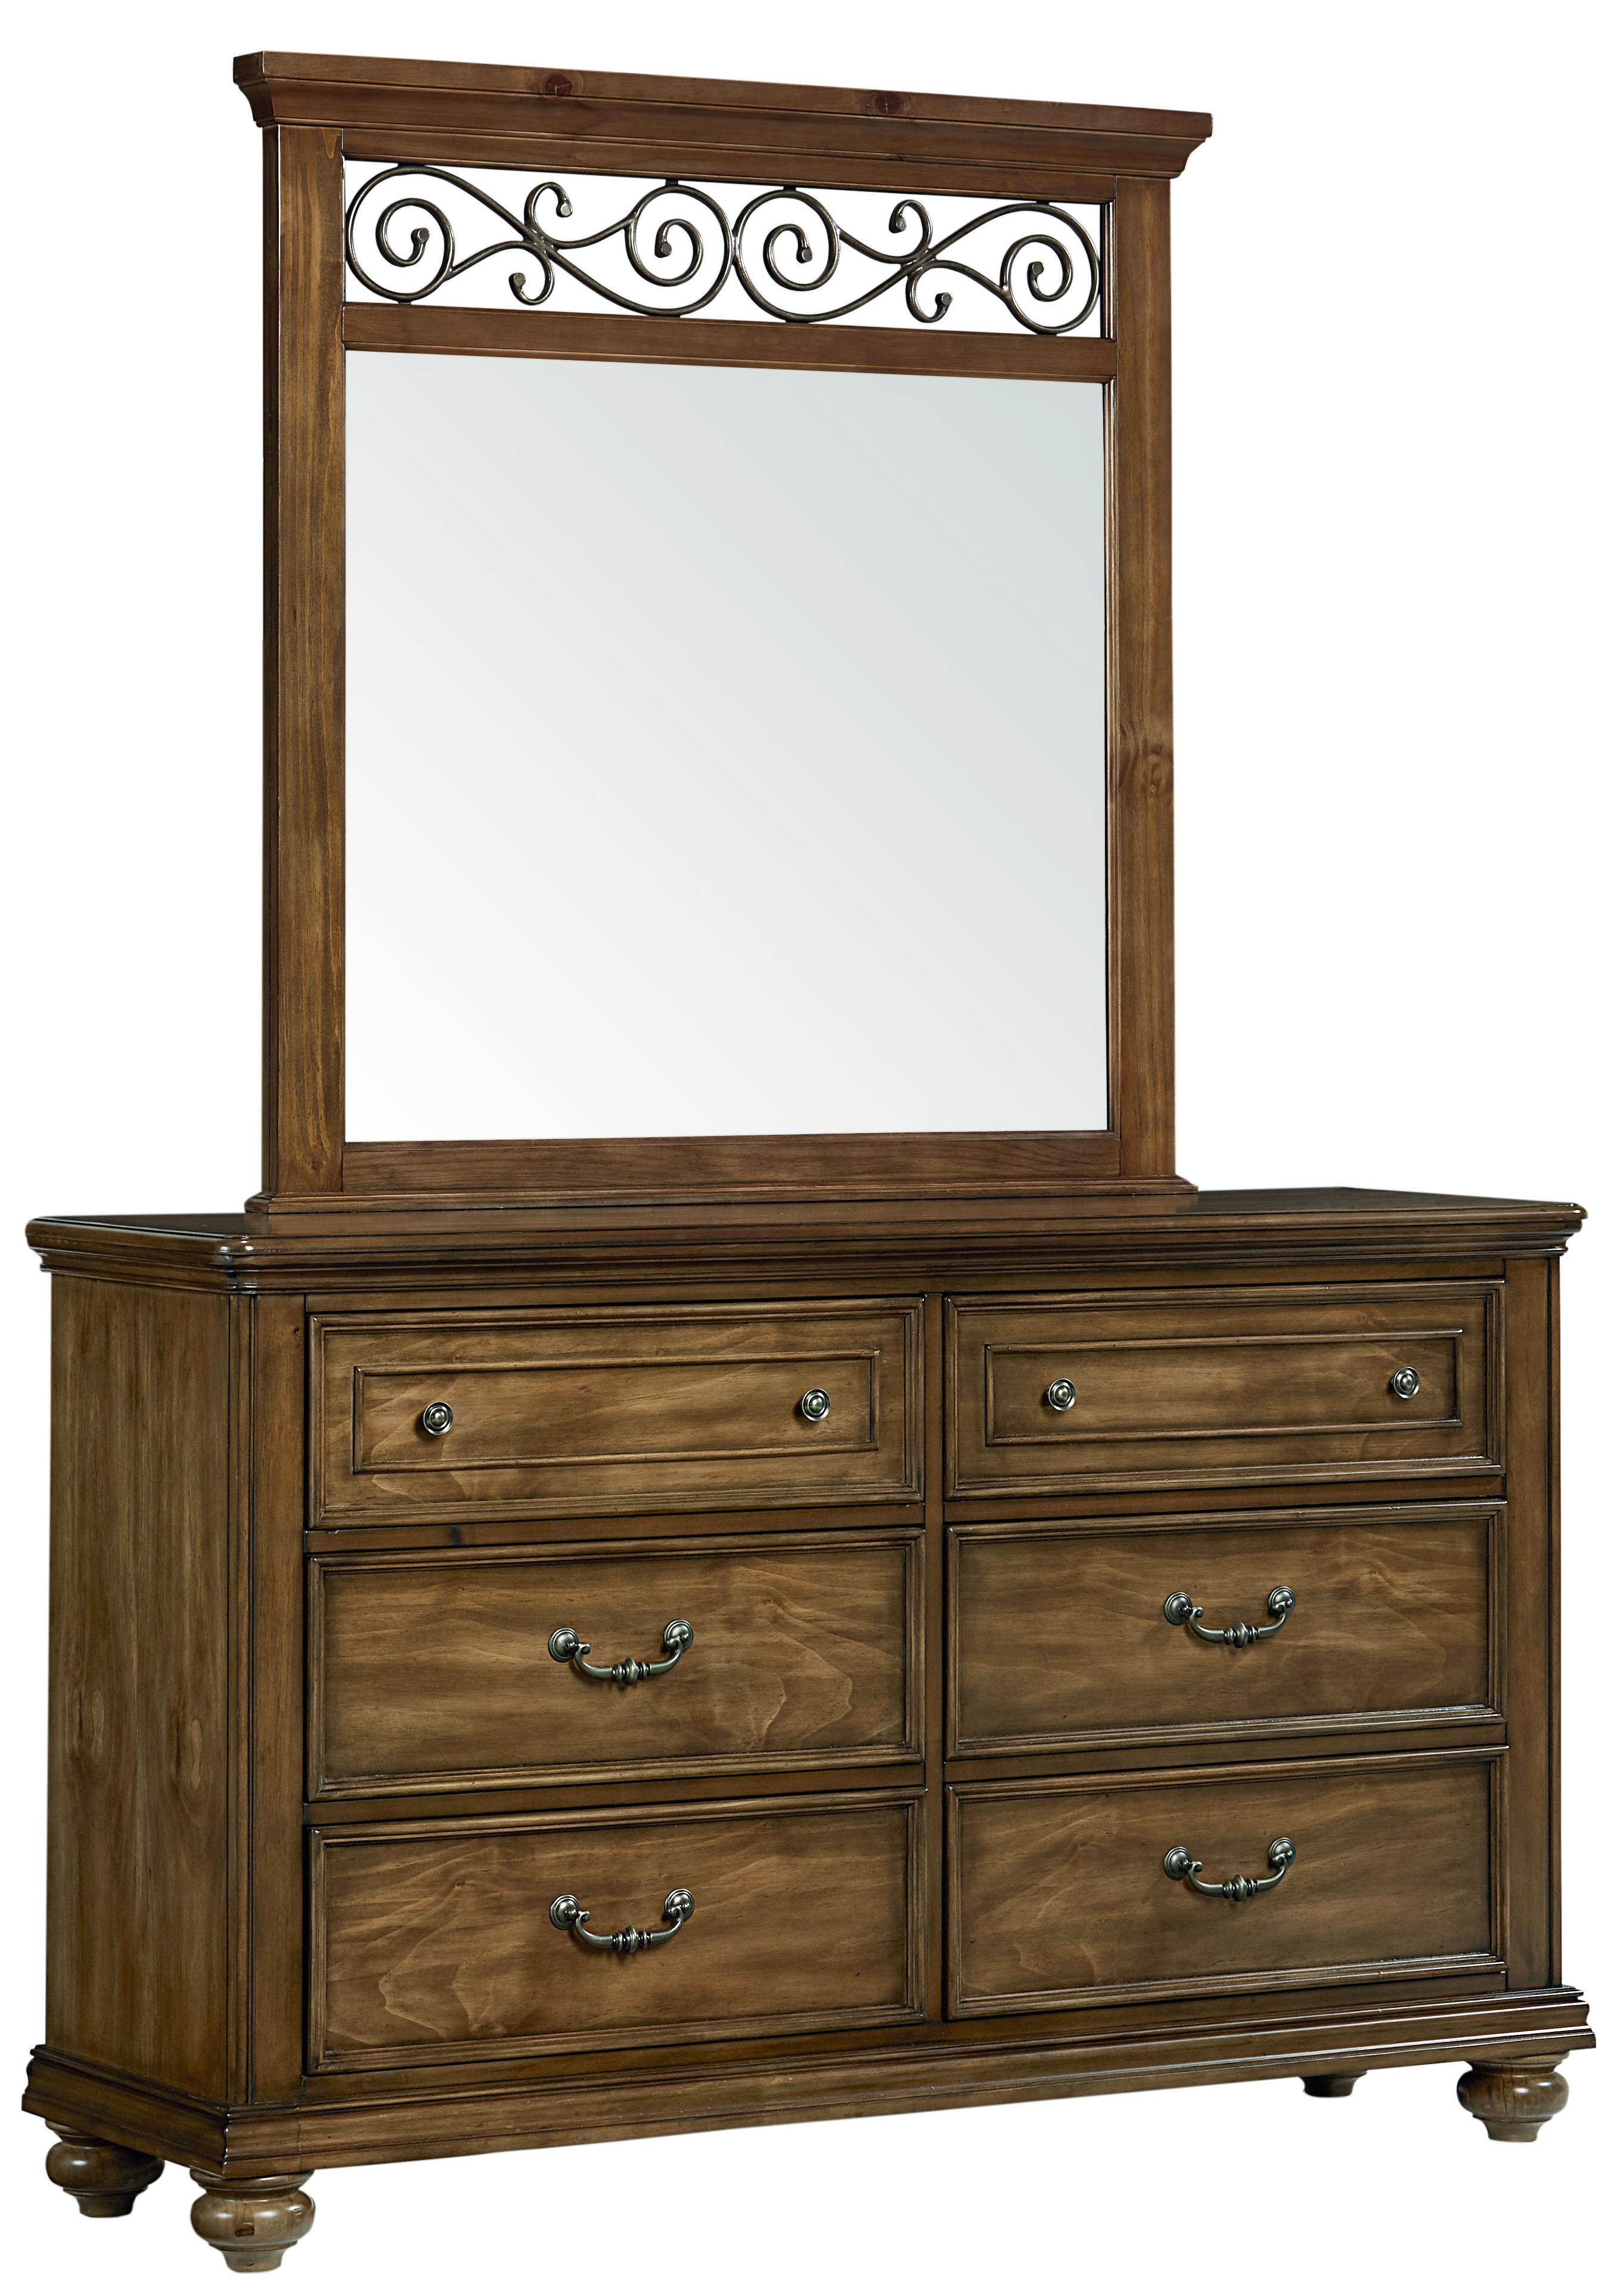 Standard Furniture Monterey Dresser and Mirror Set - Item Number: 81908+81909